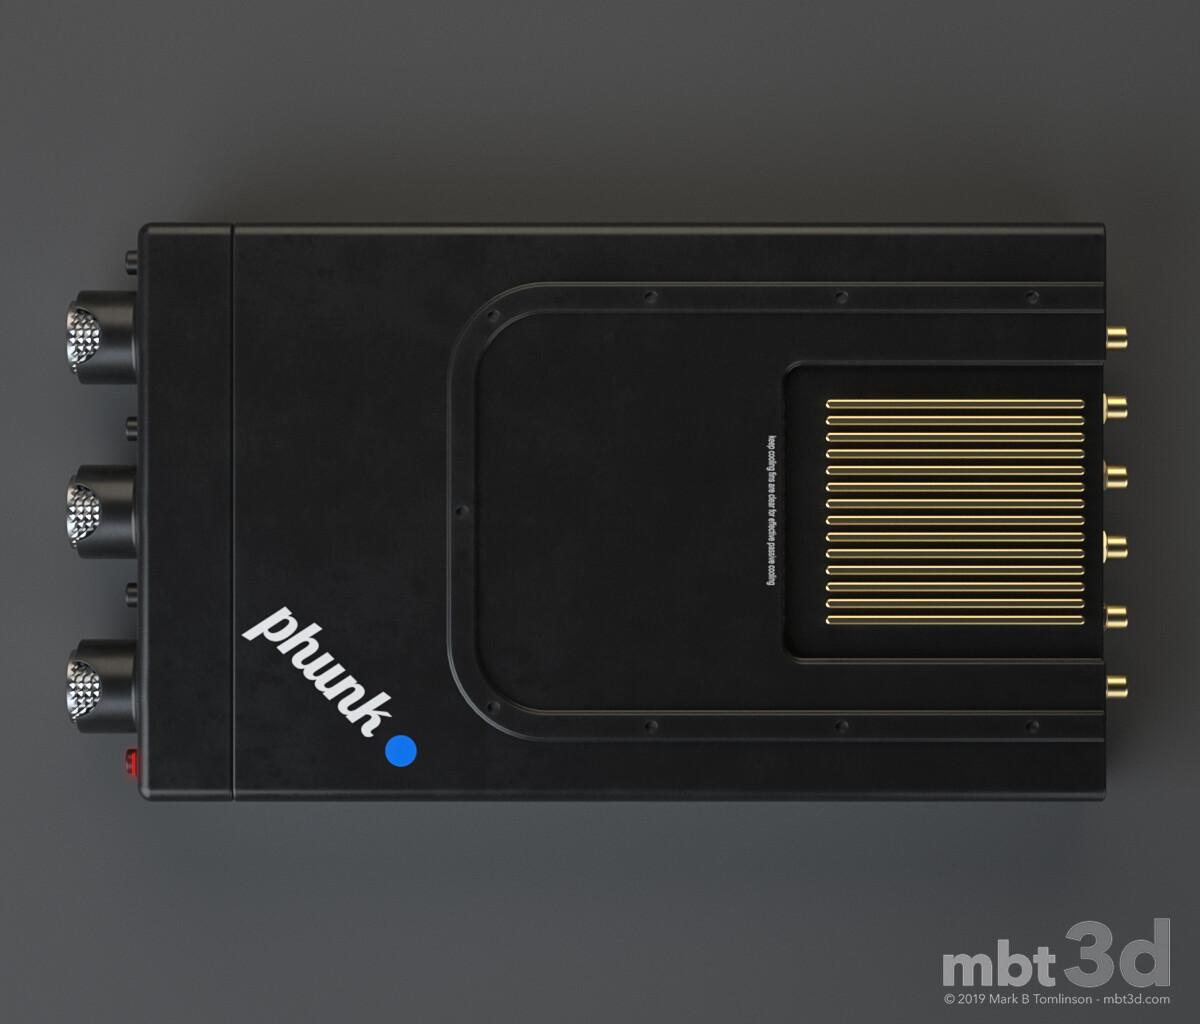 Mark b tomlinson flat control box 08